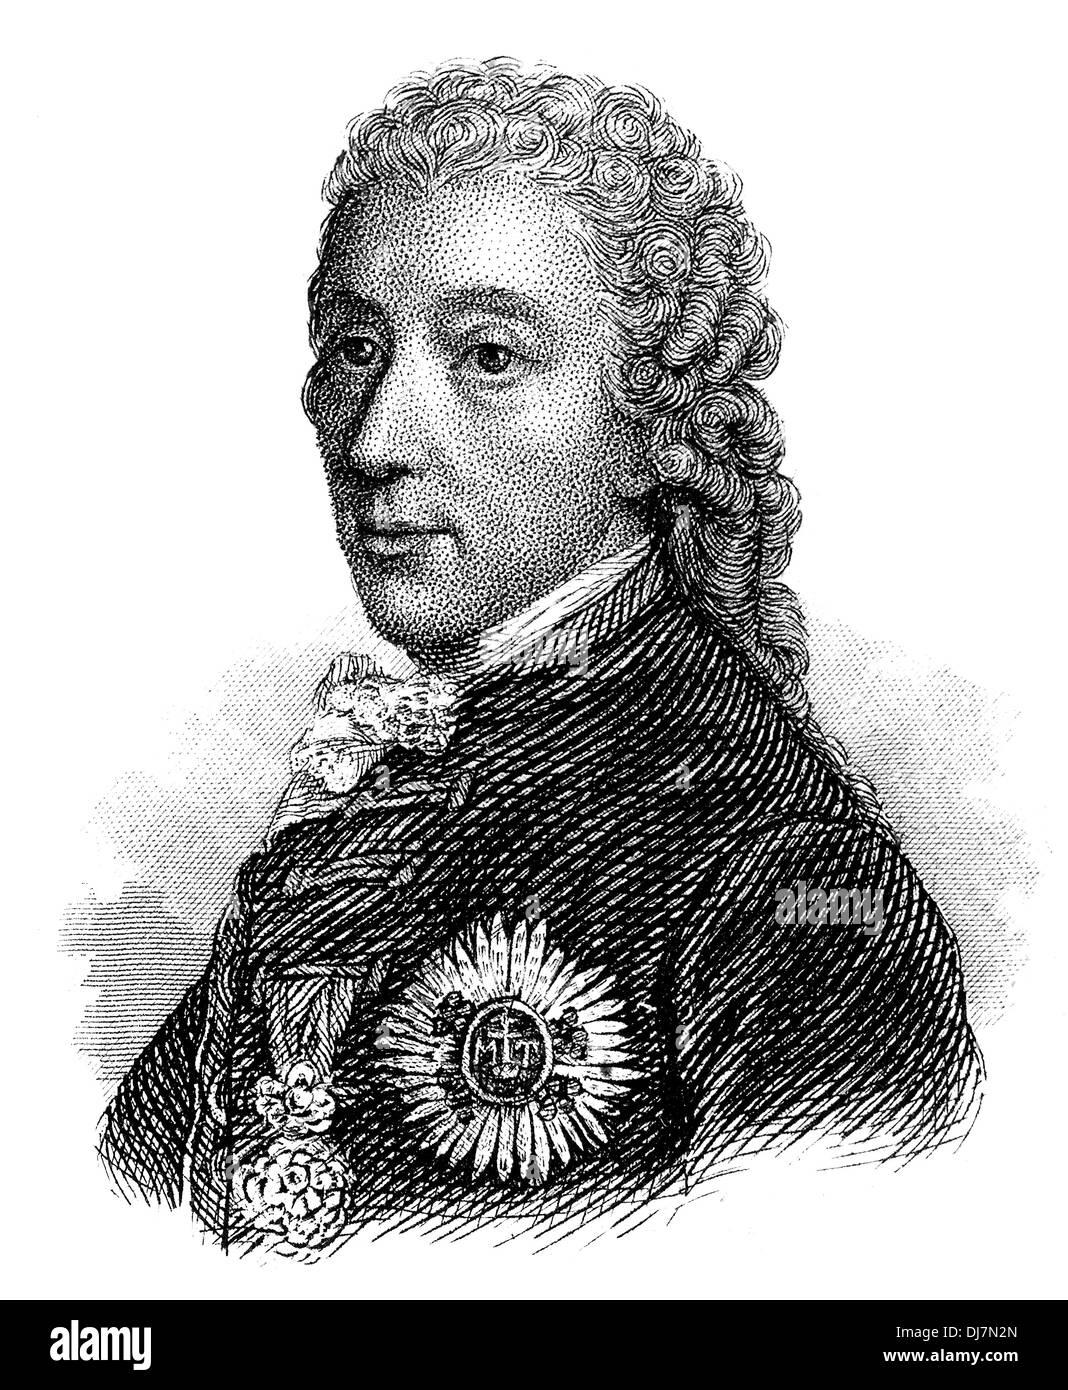 Wenzel Anton Graf Kaunitz, 1711 - 1794, Imperial Prince of Kaunitz-Rietberg, Austrian statesman of the enlightened Stock Photo